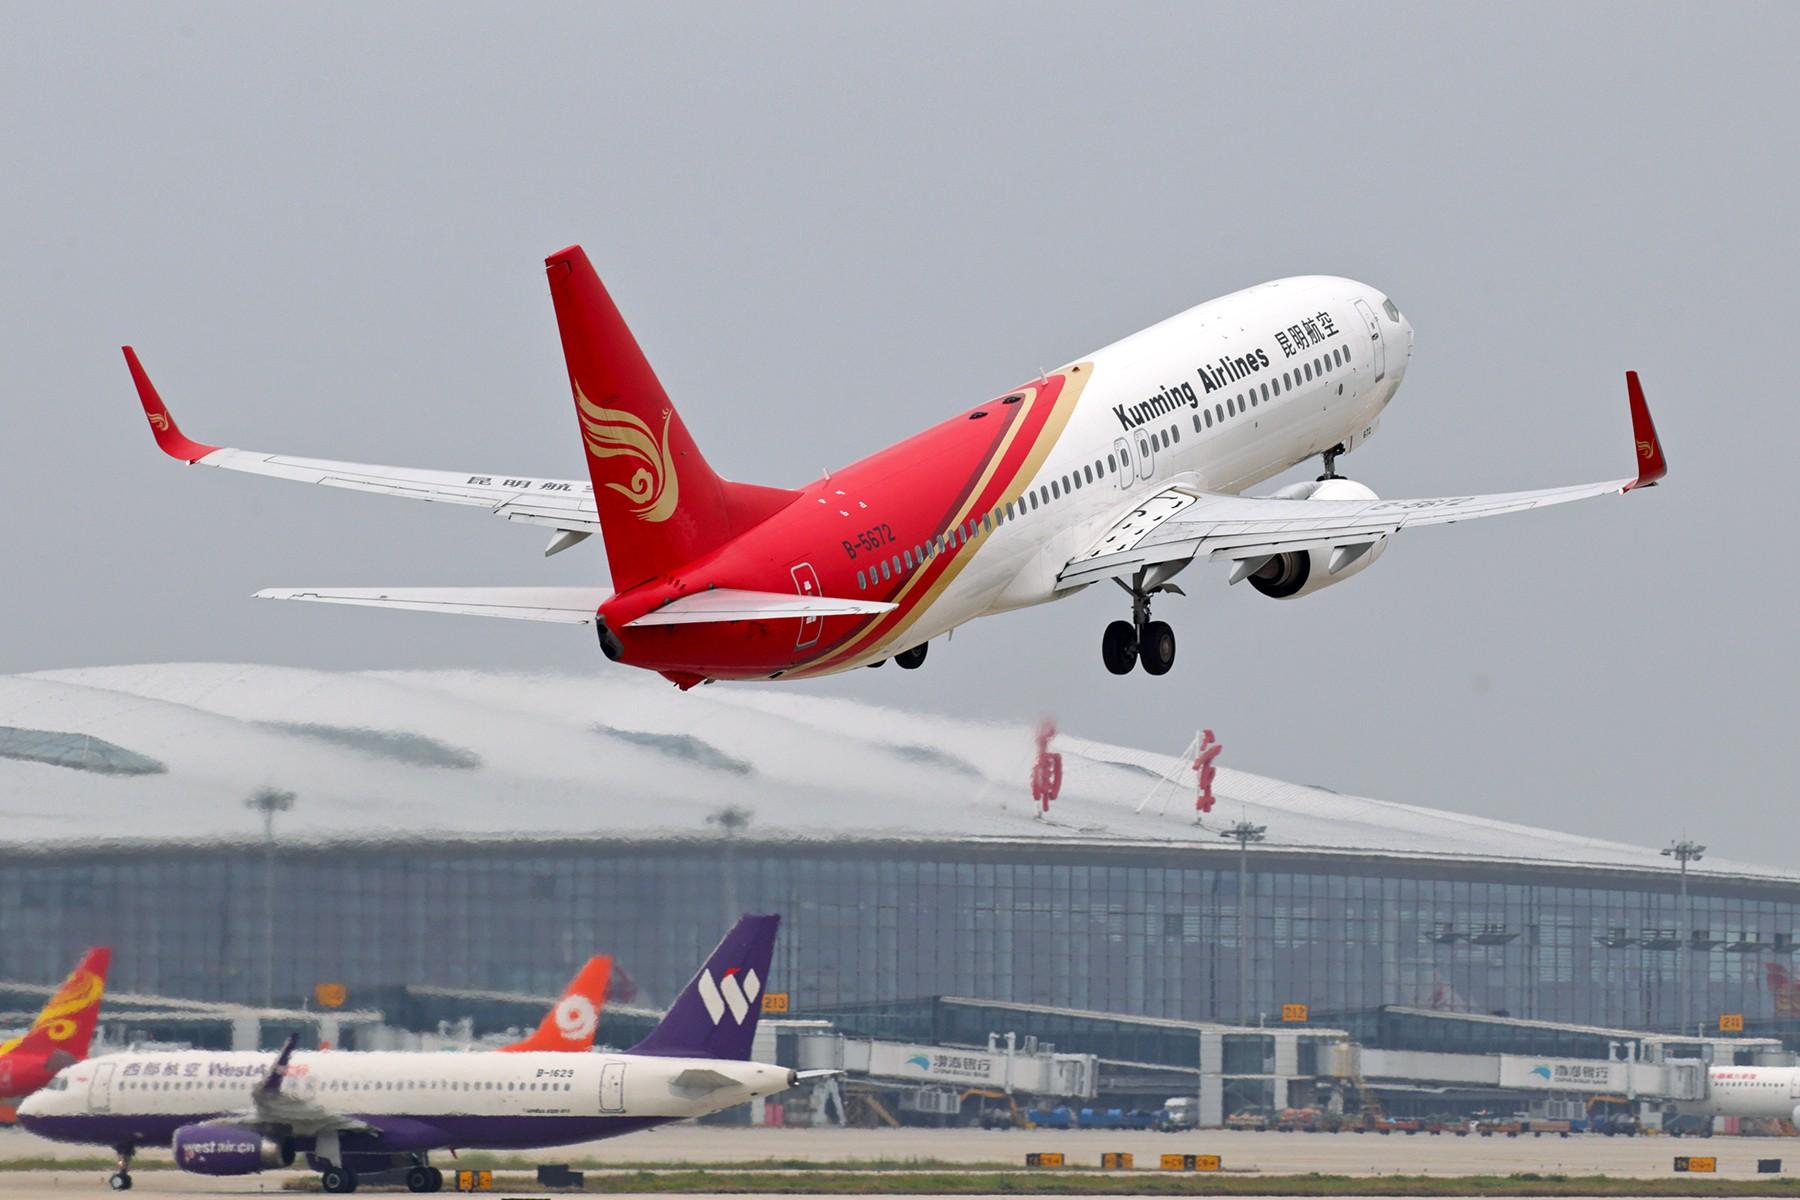 Re:[原创]【BLDDQ】******NKG07/25单跑道运行中****** BOEING 737-800 B-5672 中国南京禄口国际机场